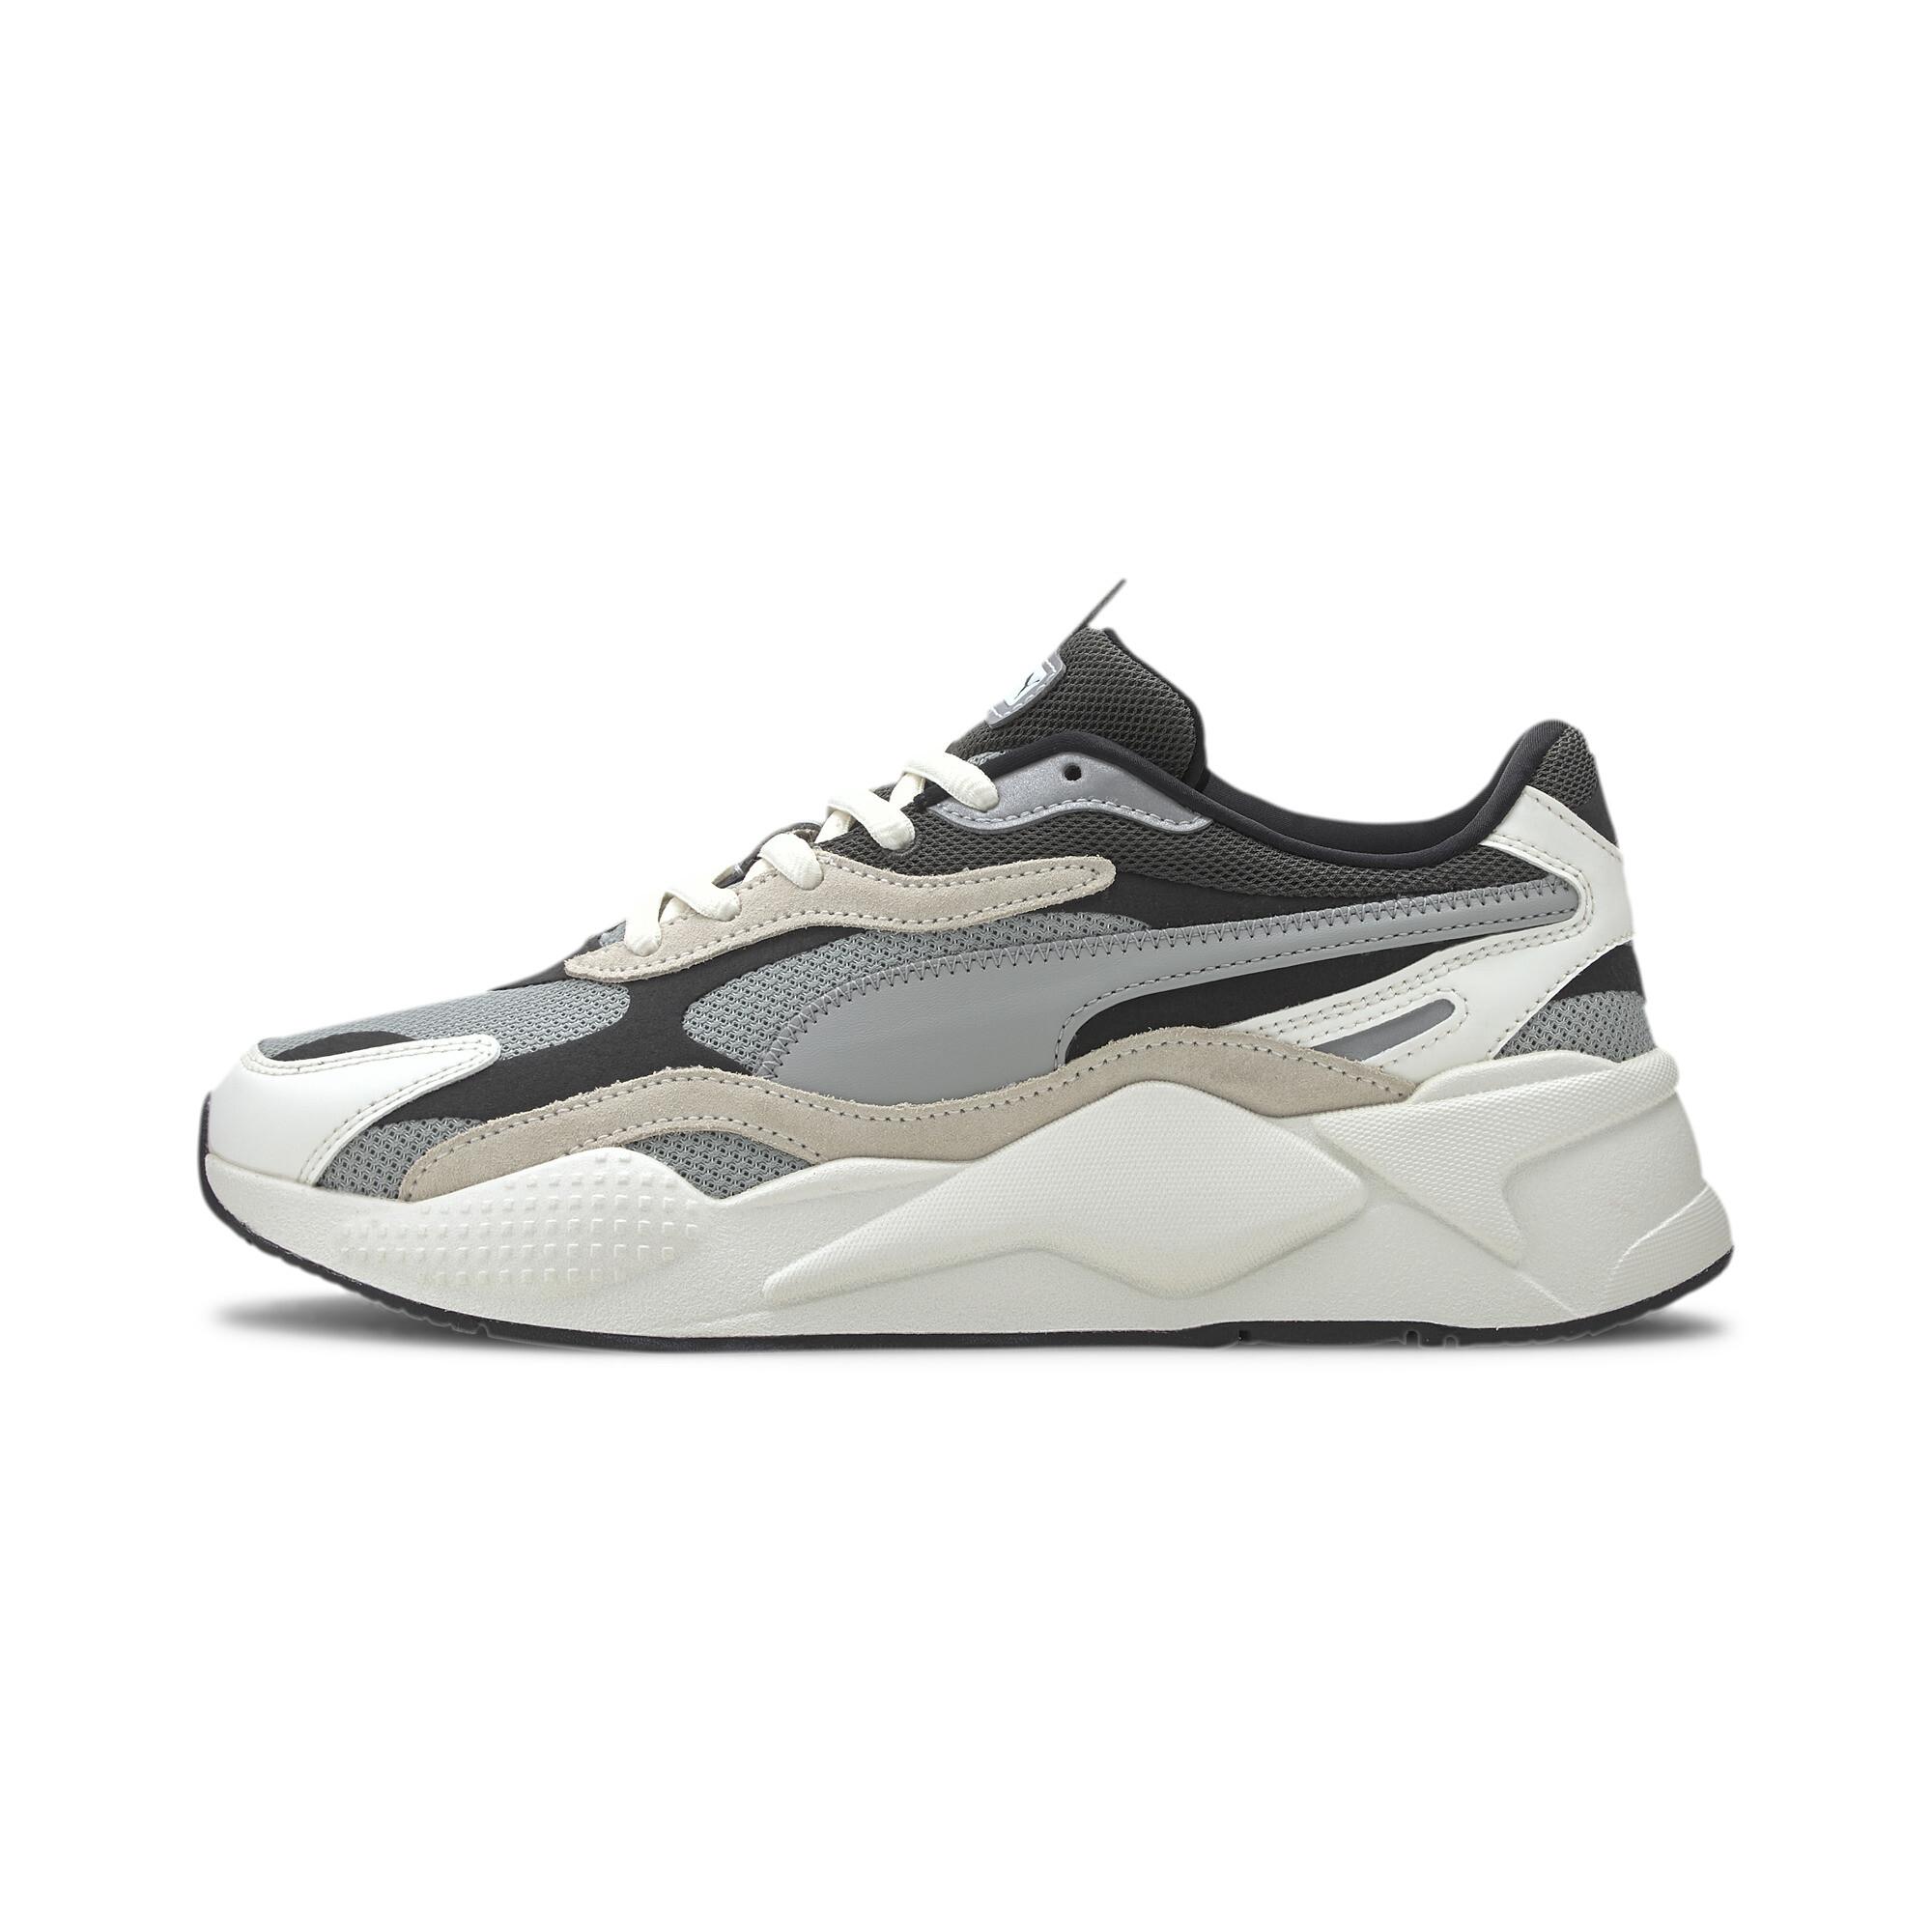 PUMA-Men-039-s-RS-X-Puzzle-Sneakers thumbnail 11